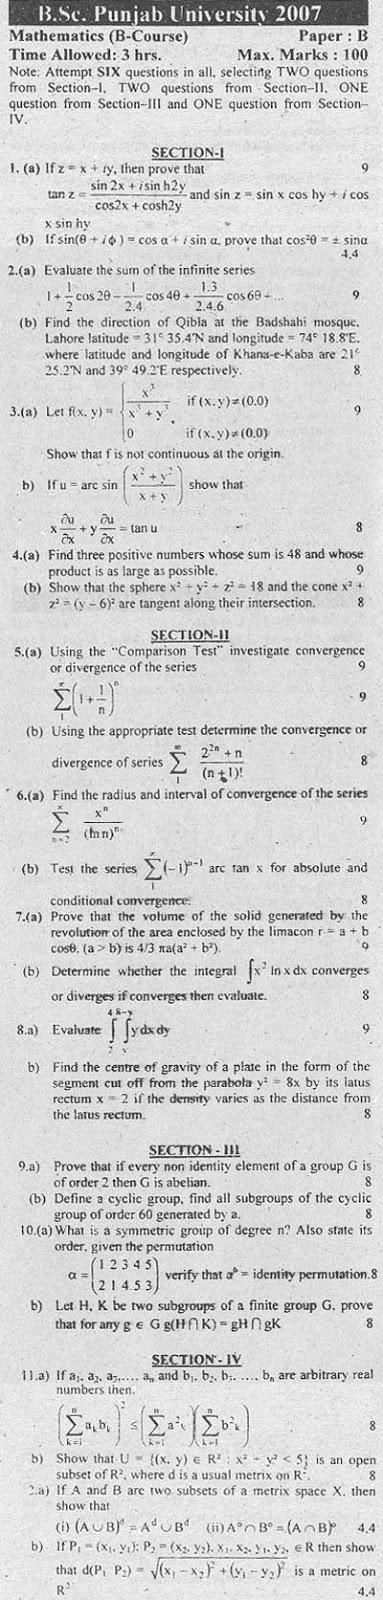 B Sc Mathematics Punjab University past papers - Ratta pk